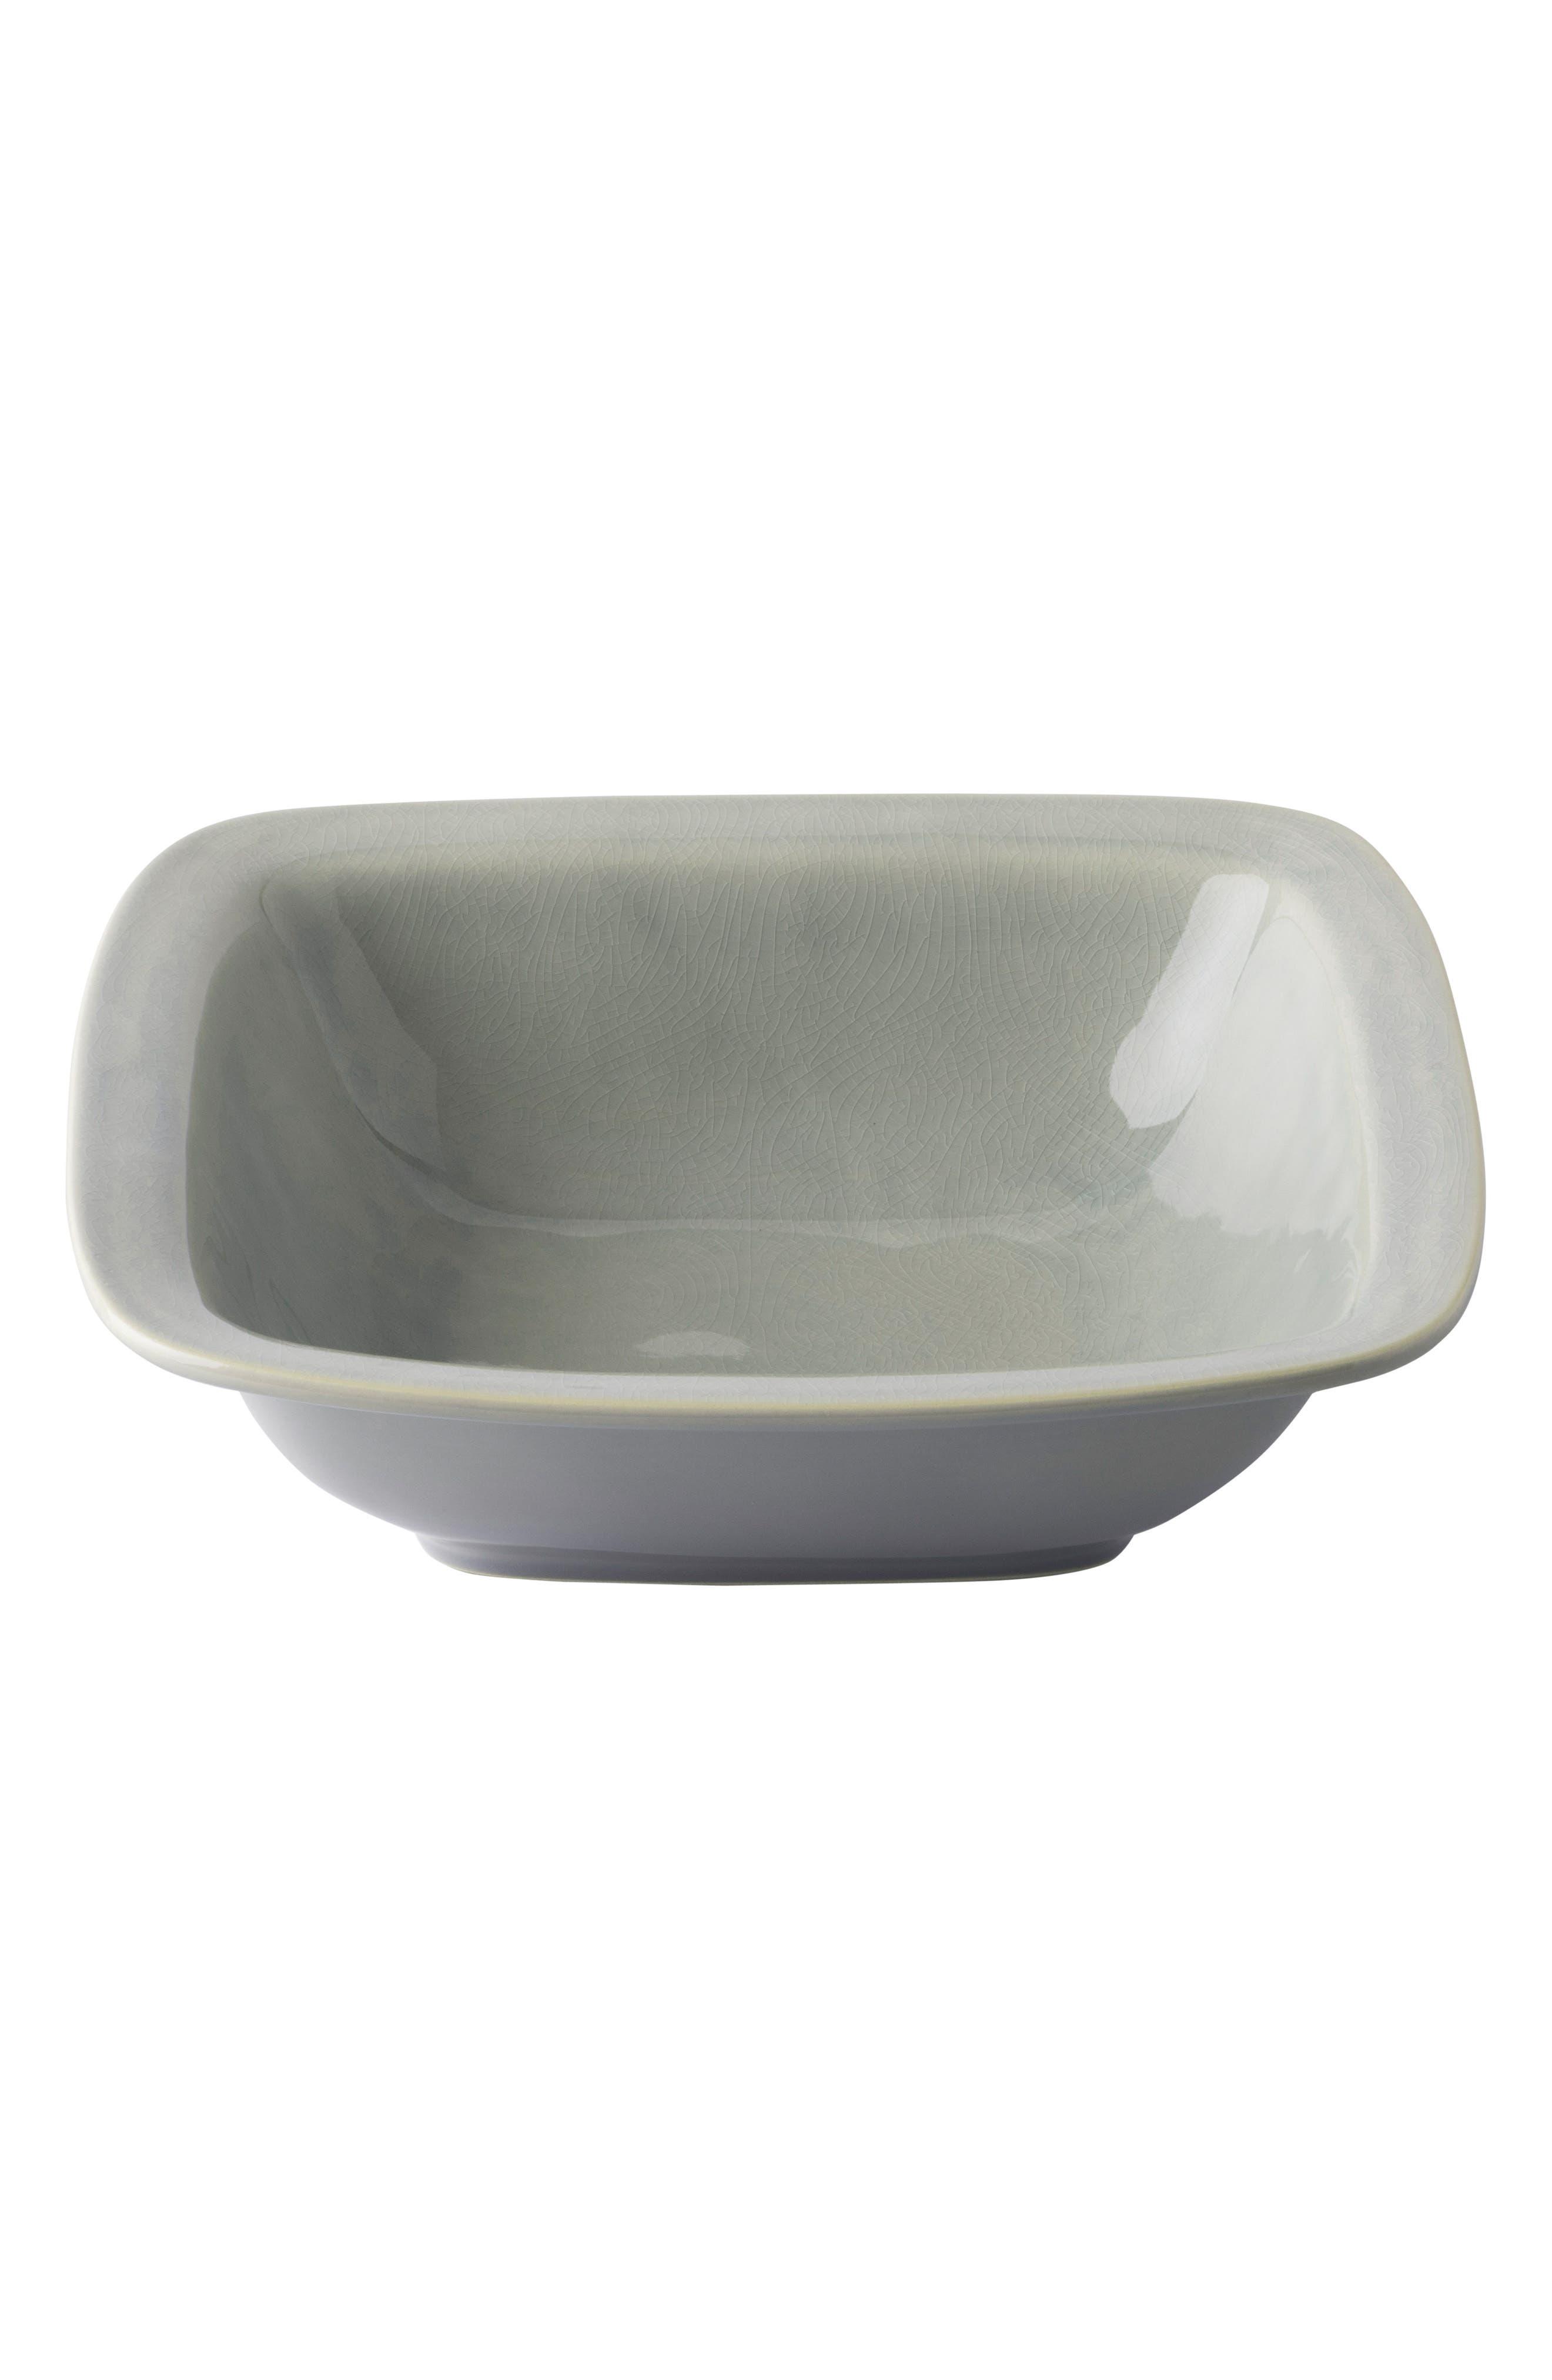 Puro Large Ceramic Serving Bowl,                         Main,                         color, MIST GREY CRACKLE